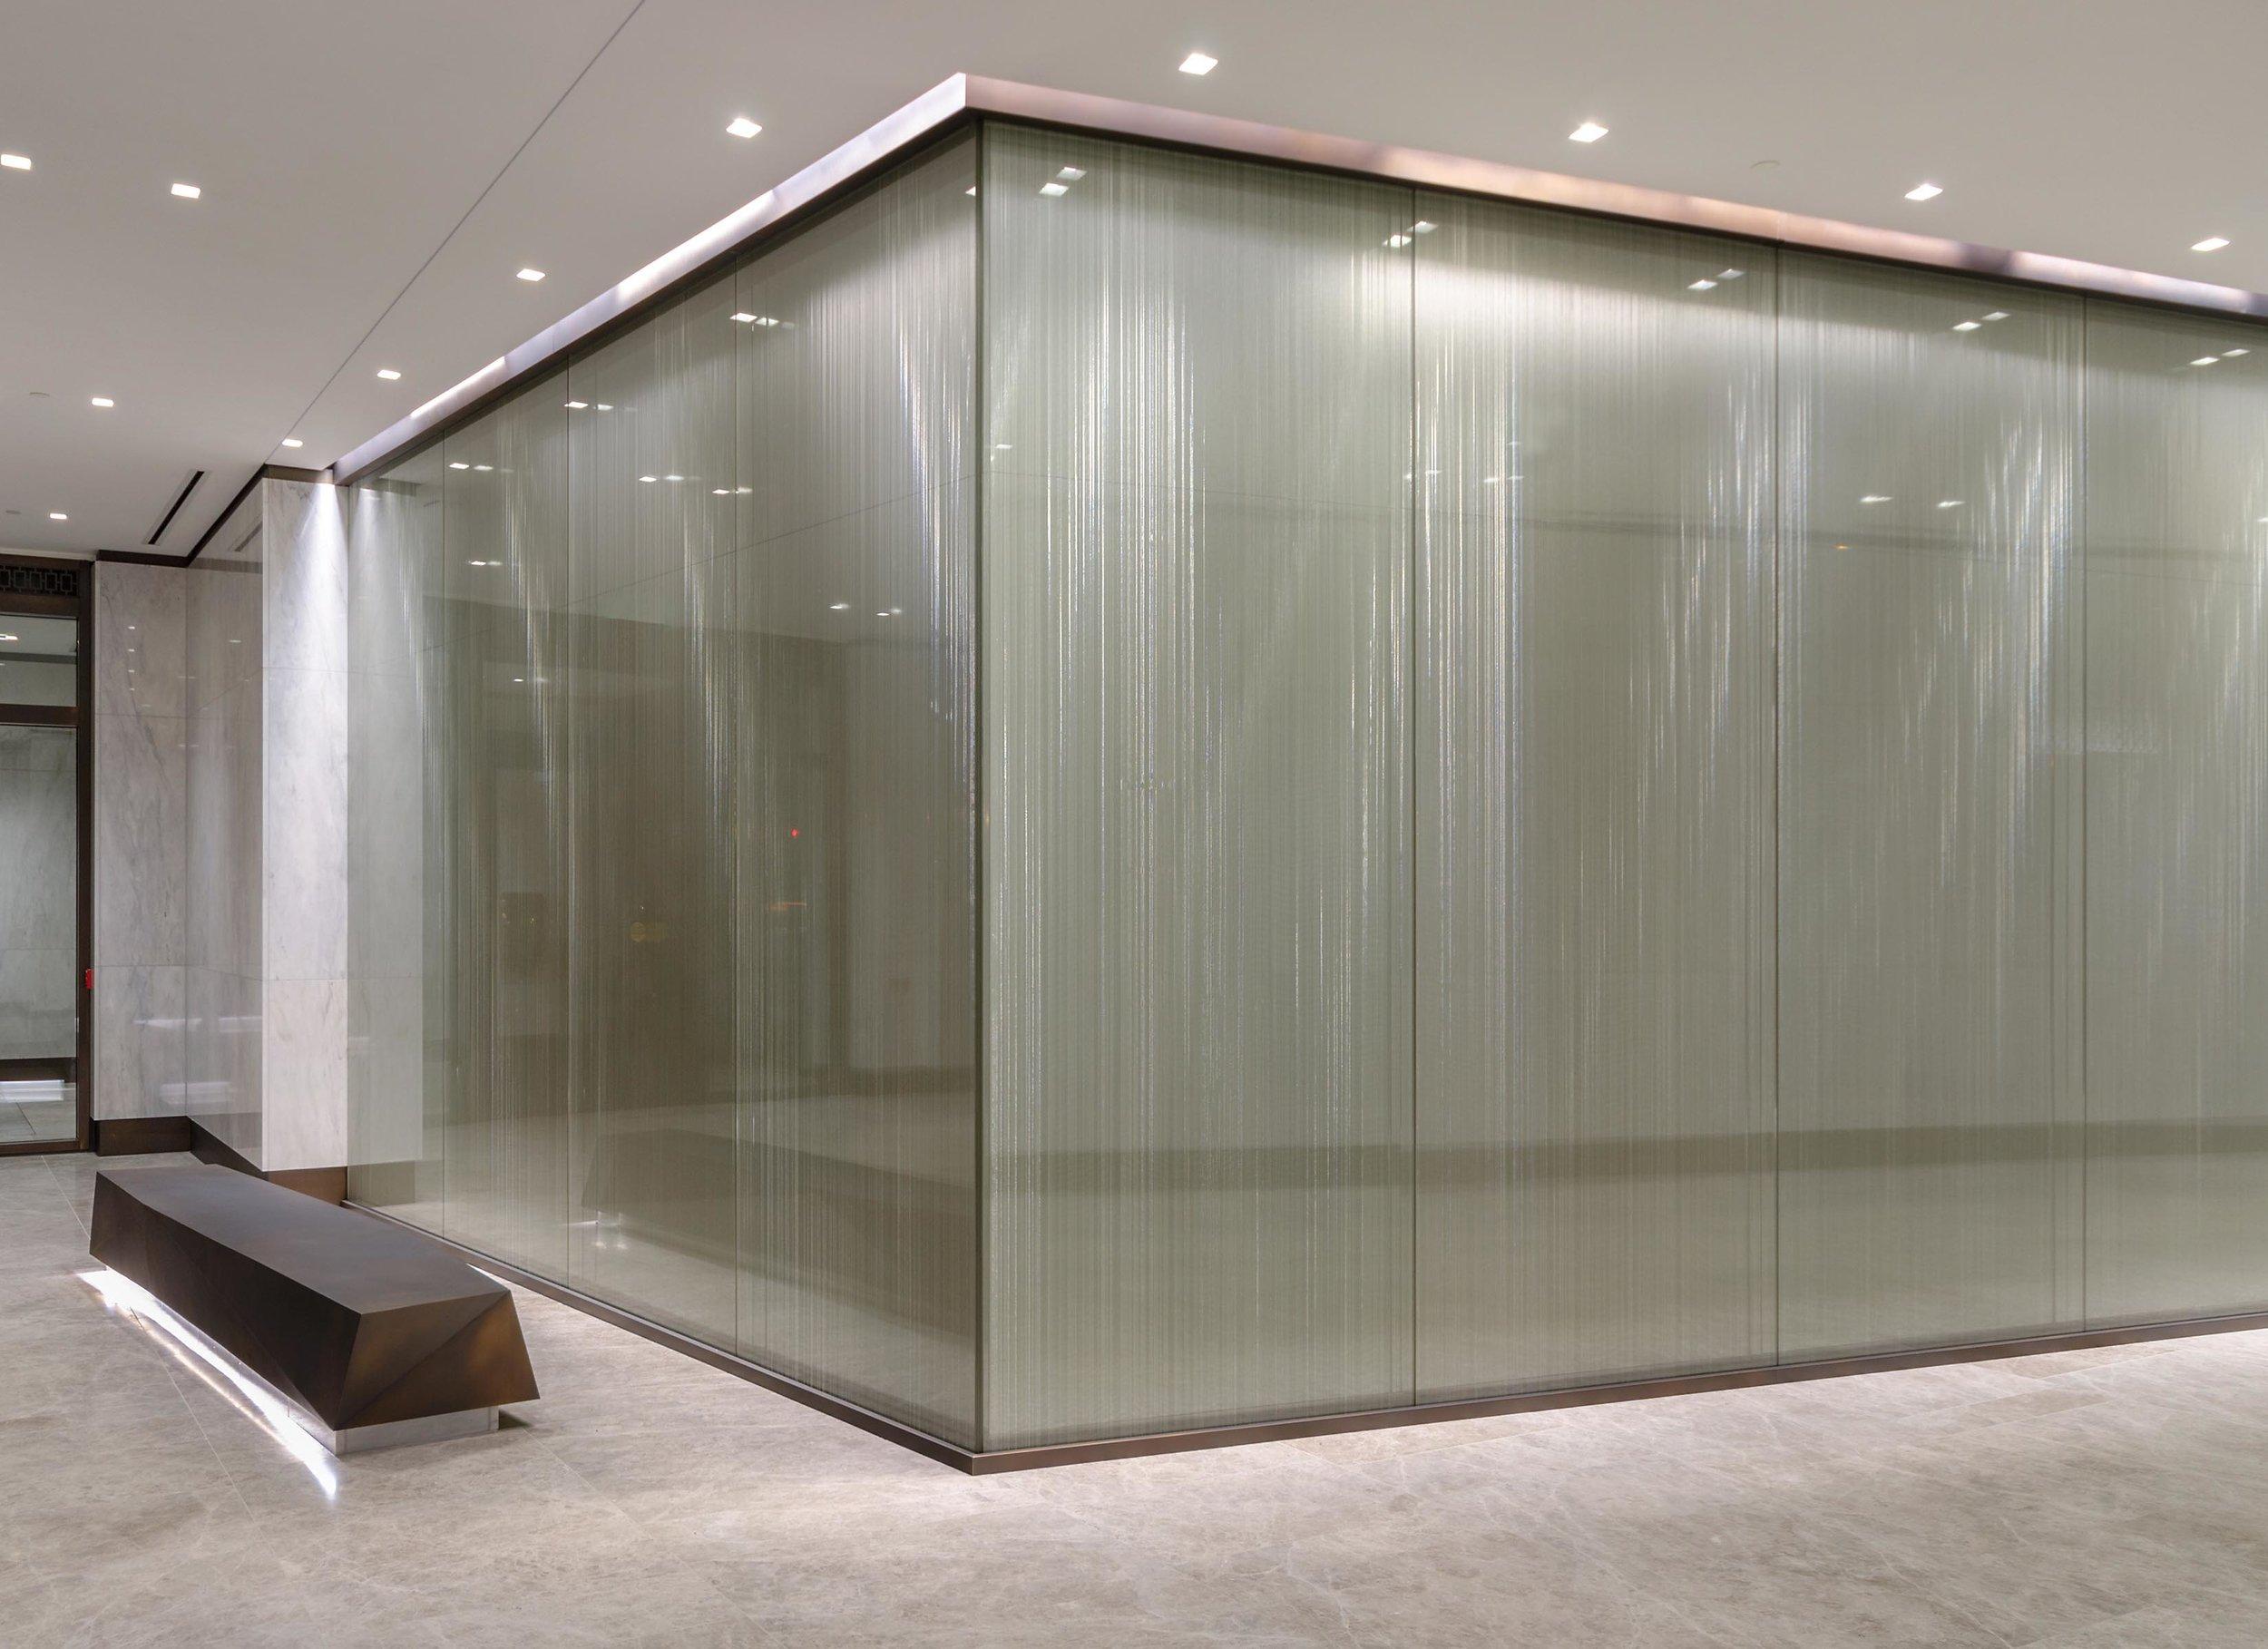 Sophie-Mallebranche-Woven-Metal-Glass-Lamination